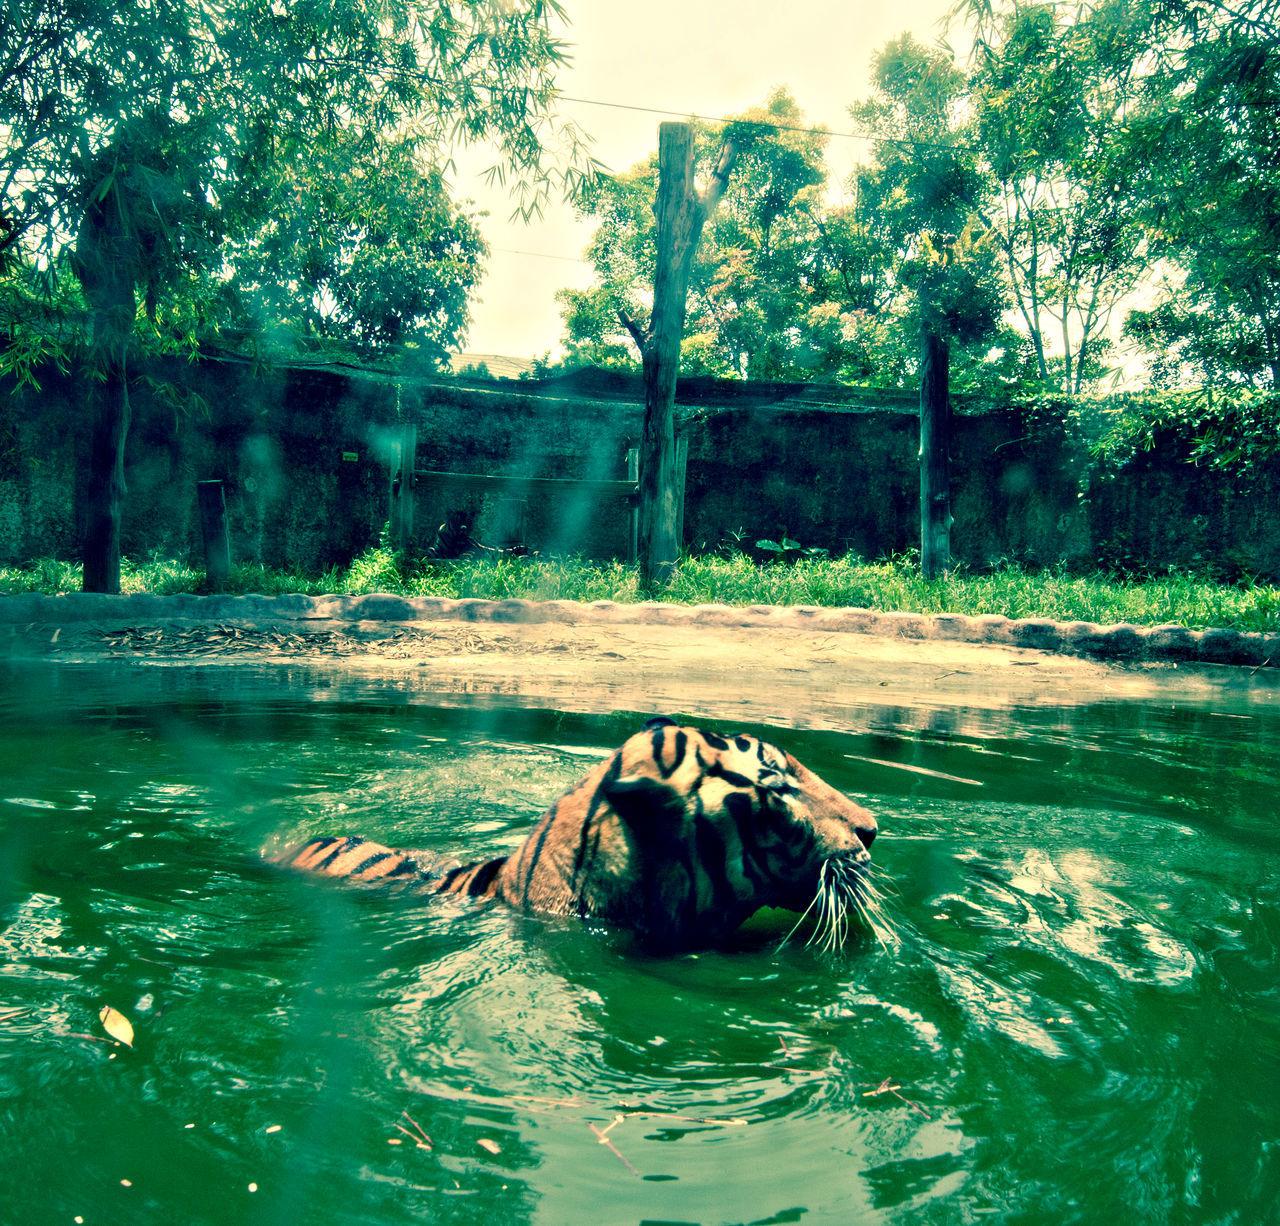 Harimau Malaya Animal Themes Animals In The Wild Day Malayan Mammal Nature No People Outdoors Panthera Tigris Jacksoni Swimming Tree Water